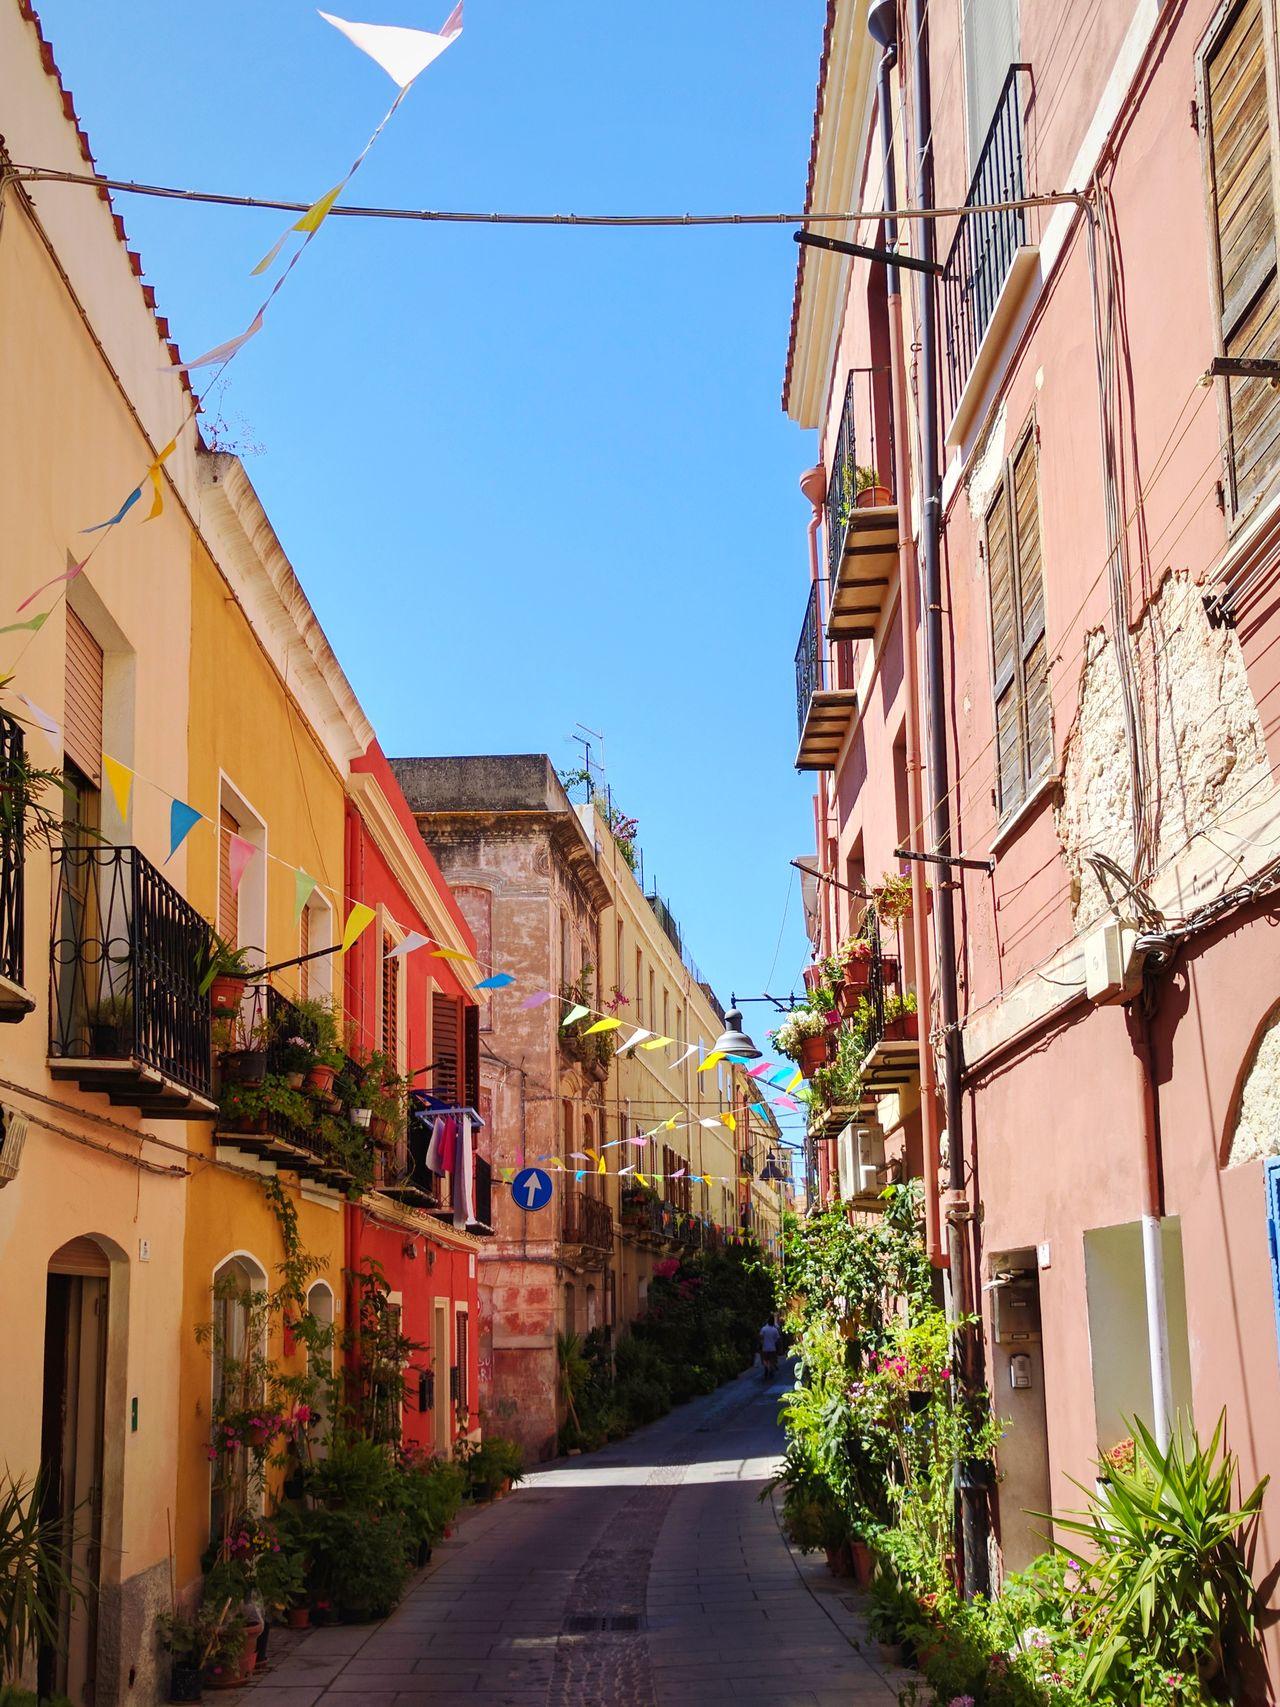 Travel Destinations Sky Architecture City Day Outdoors No People Bella Italia Cagliari, Sardinia The Way Forward Vanishing Point